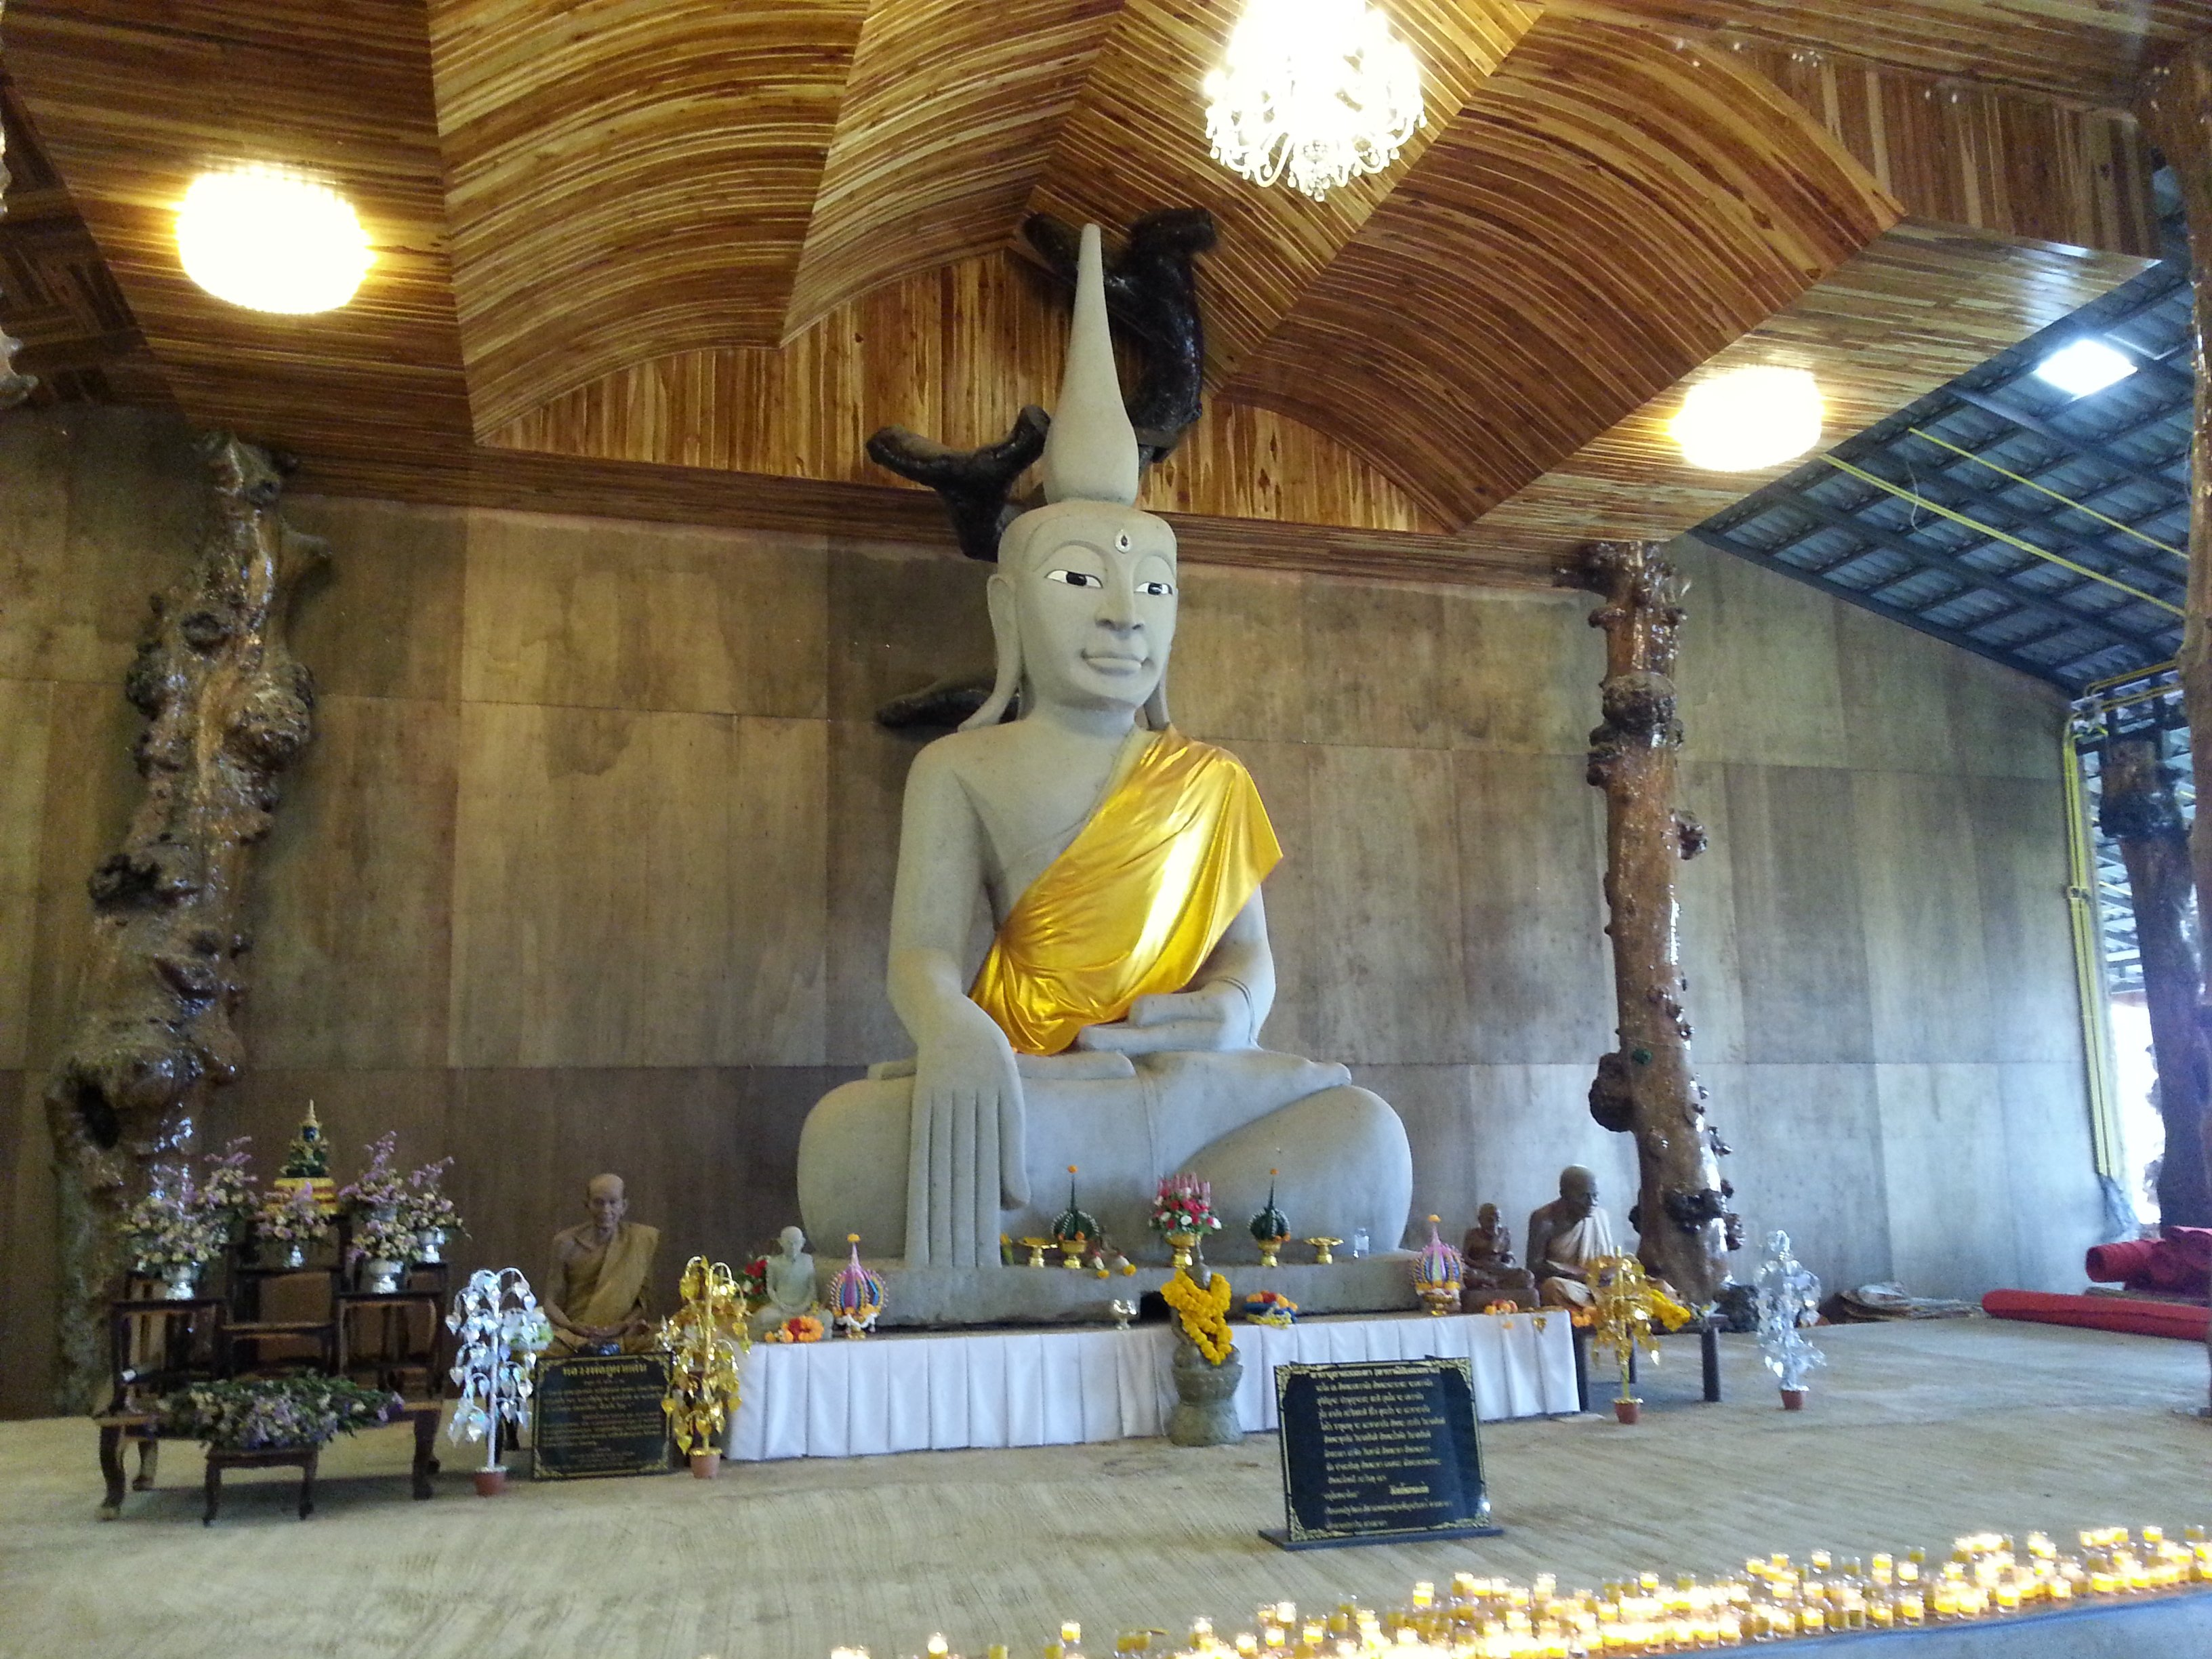 Inside the main temple at Wat Tham Pha Daen